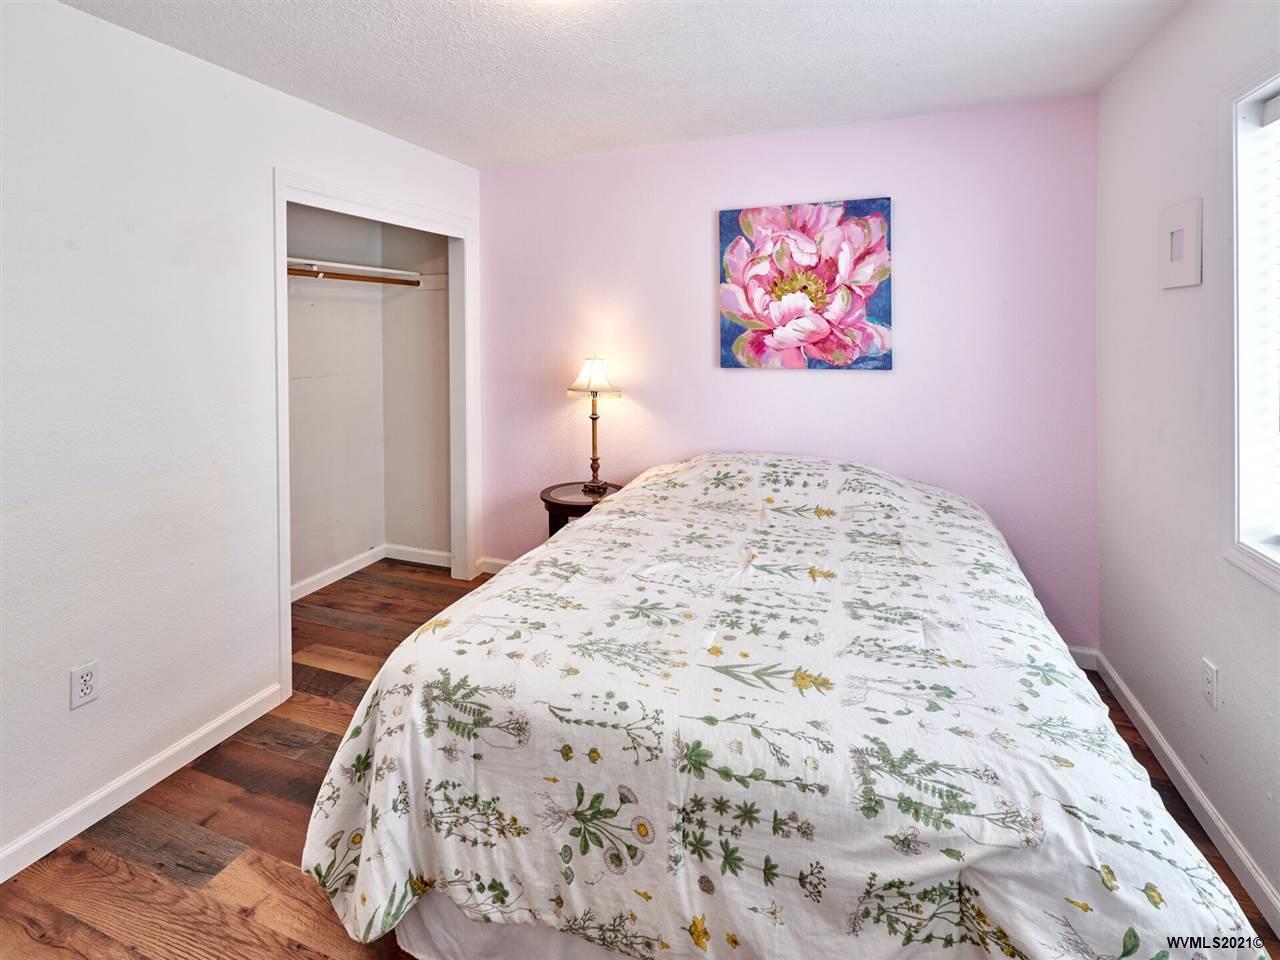 408 Lone Oaks Lp, Silverton, Oregon 97381-1470, 3 Bedrooms Bedrooms, ,2 BathroomsBathrooms,Single Family,For Sale,408 Lone Oaks Lp,1,774997